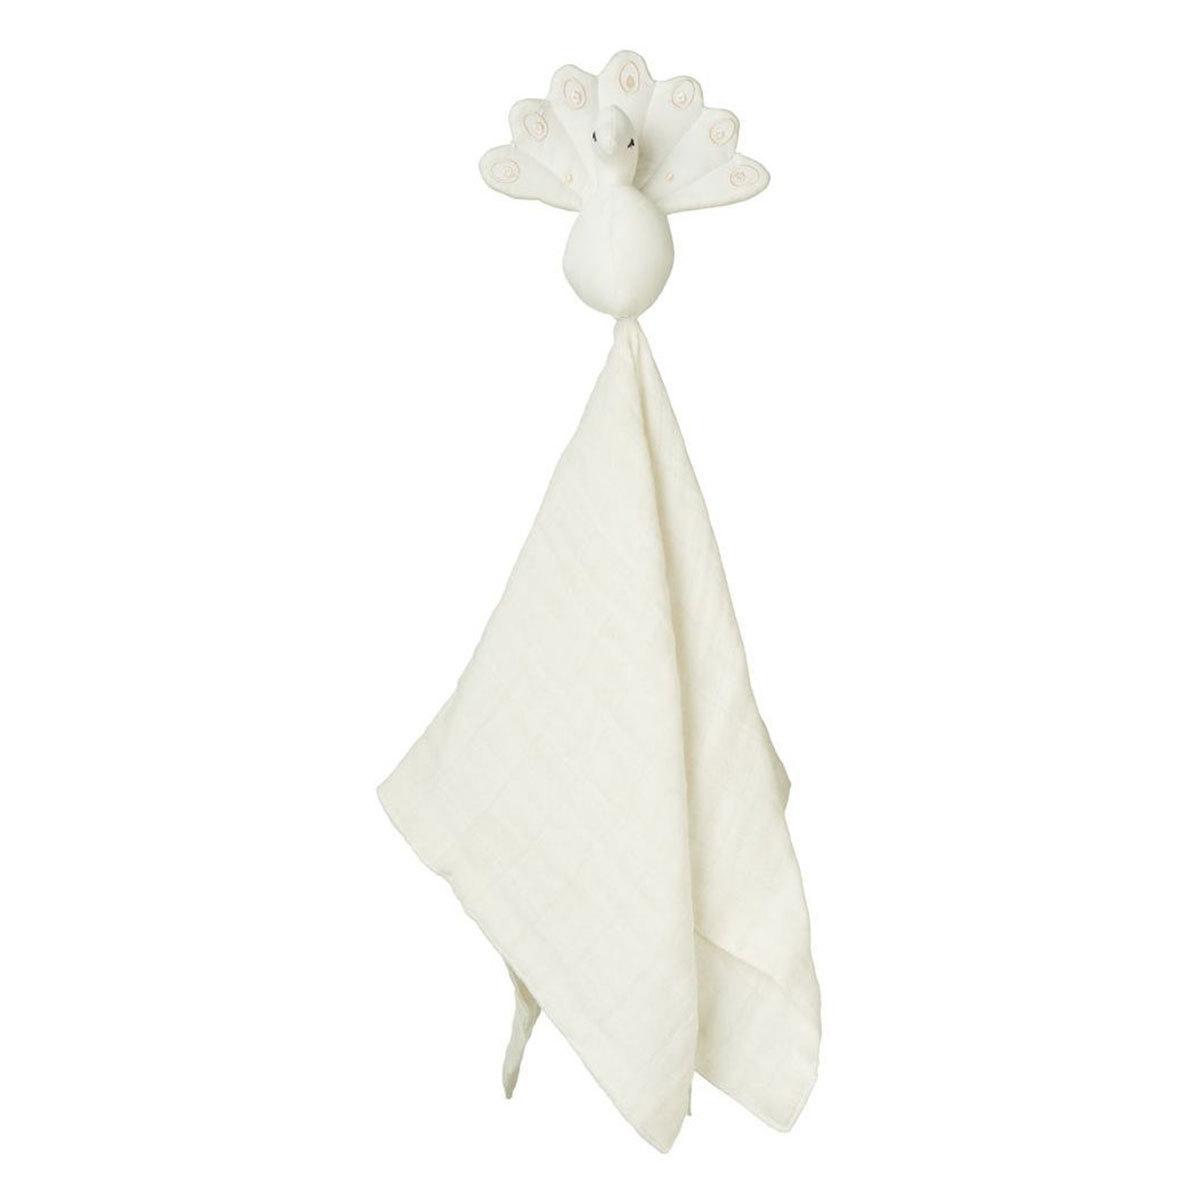 Doudou Doudou Paon - Blanc Crème Cam Cam - AR201910300023